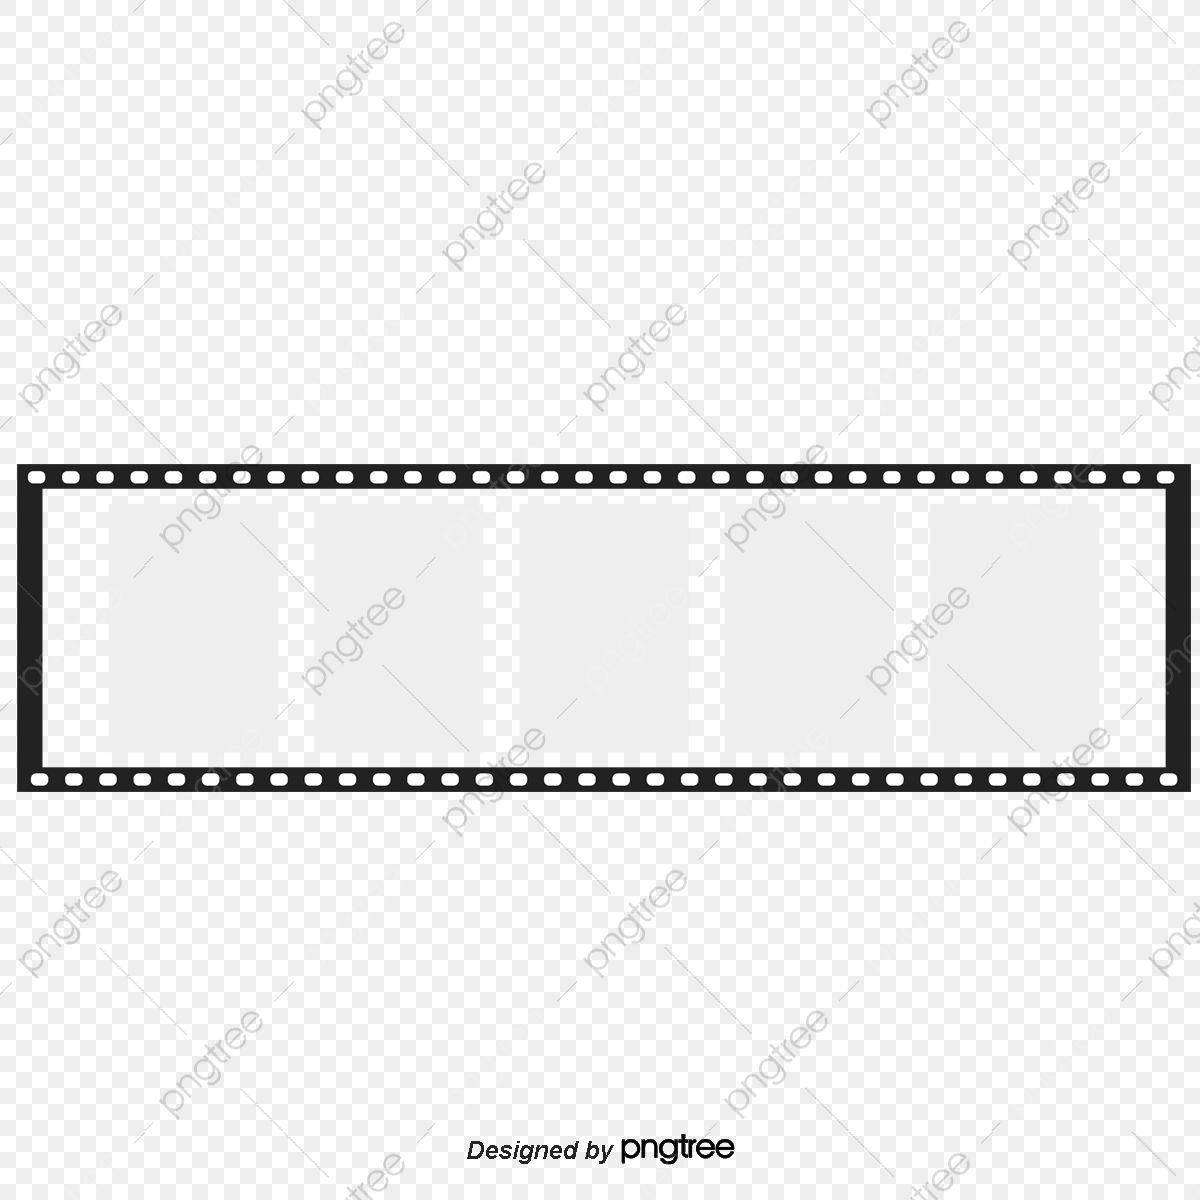 Black Box Film Film Clipart Texture Border Black Png Transparent Clipart Image And Psd File For Free Download Clip Art Black Box Clipart Images